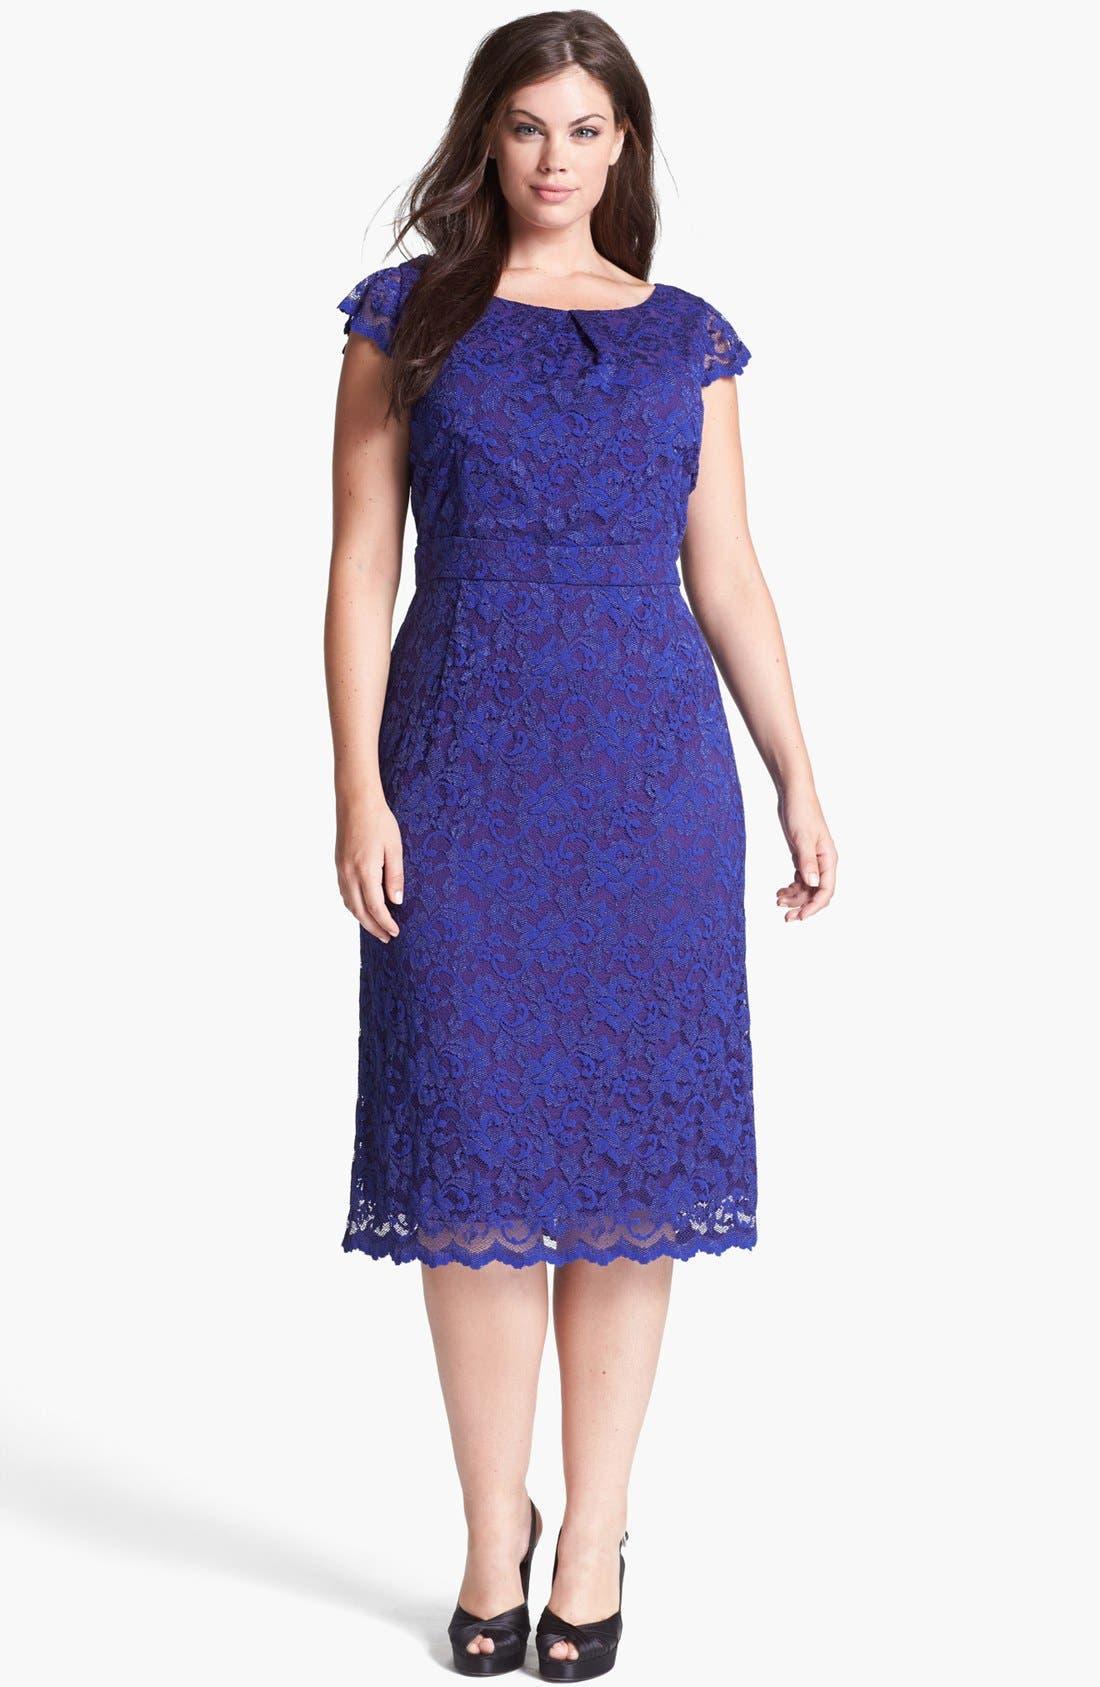 Alternate Image 1 Selected - ABS by Allen Schwartz Lace Pencil Dress (Plus Size)